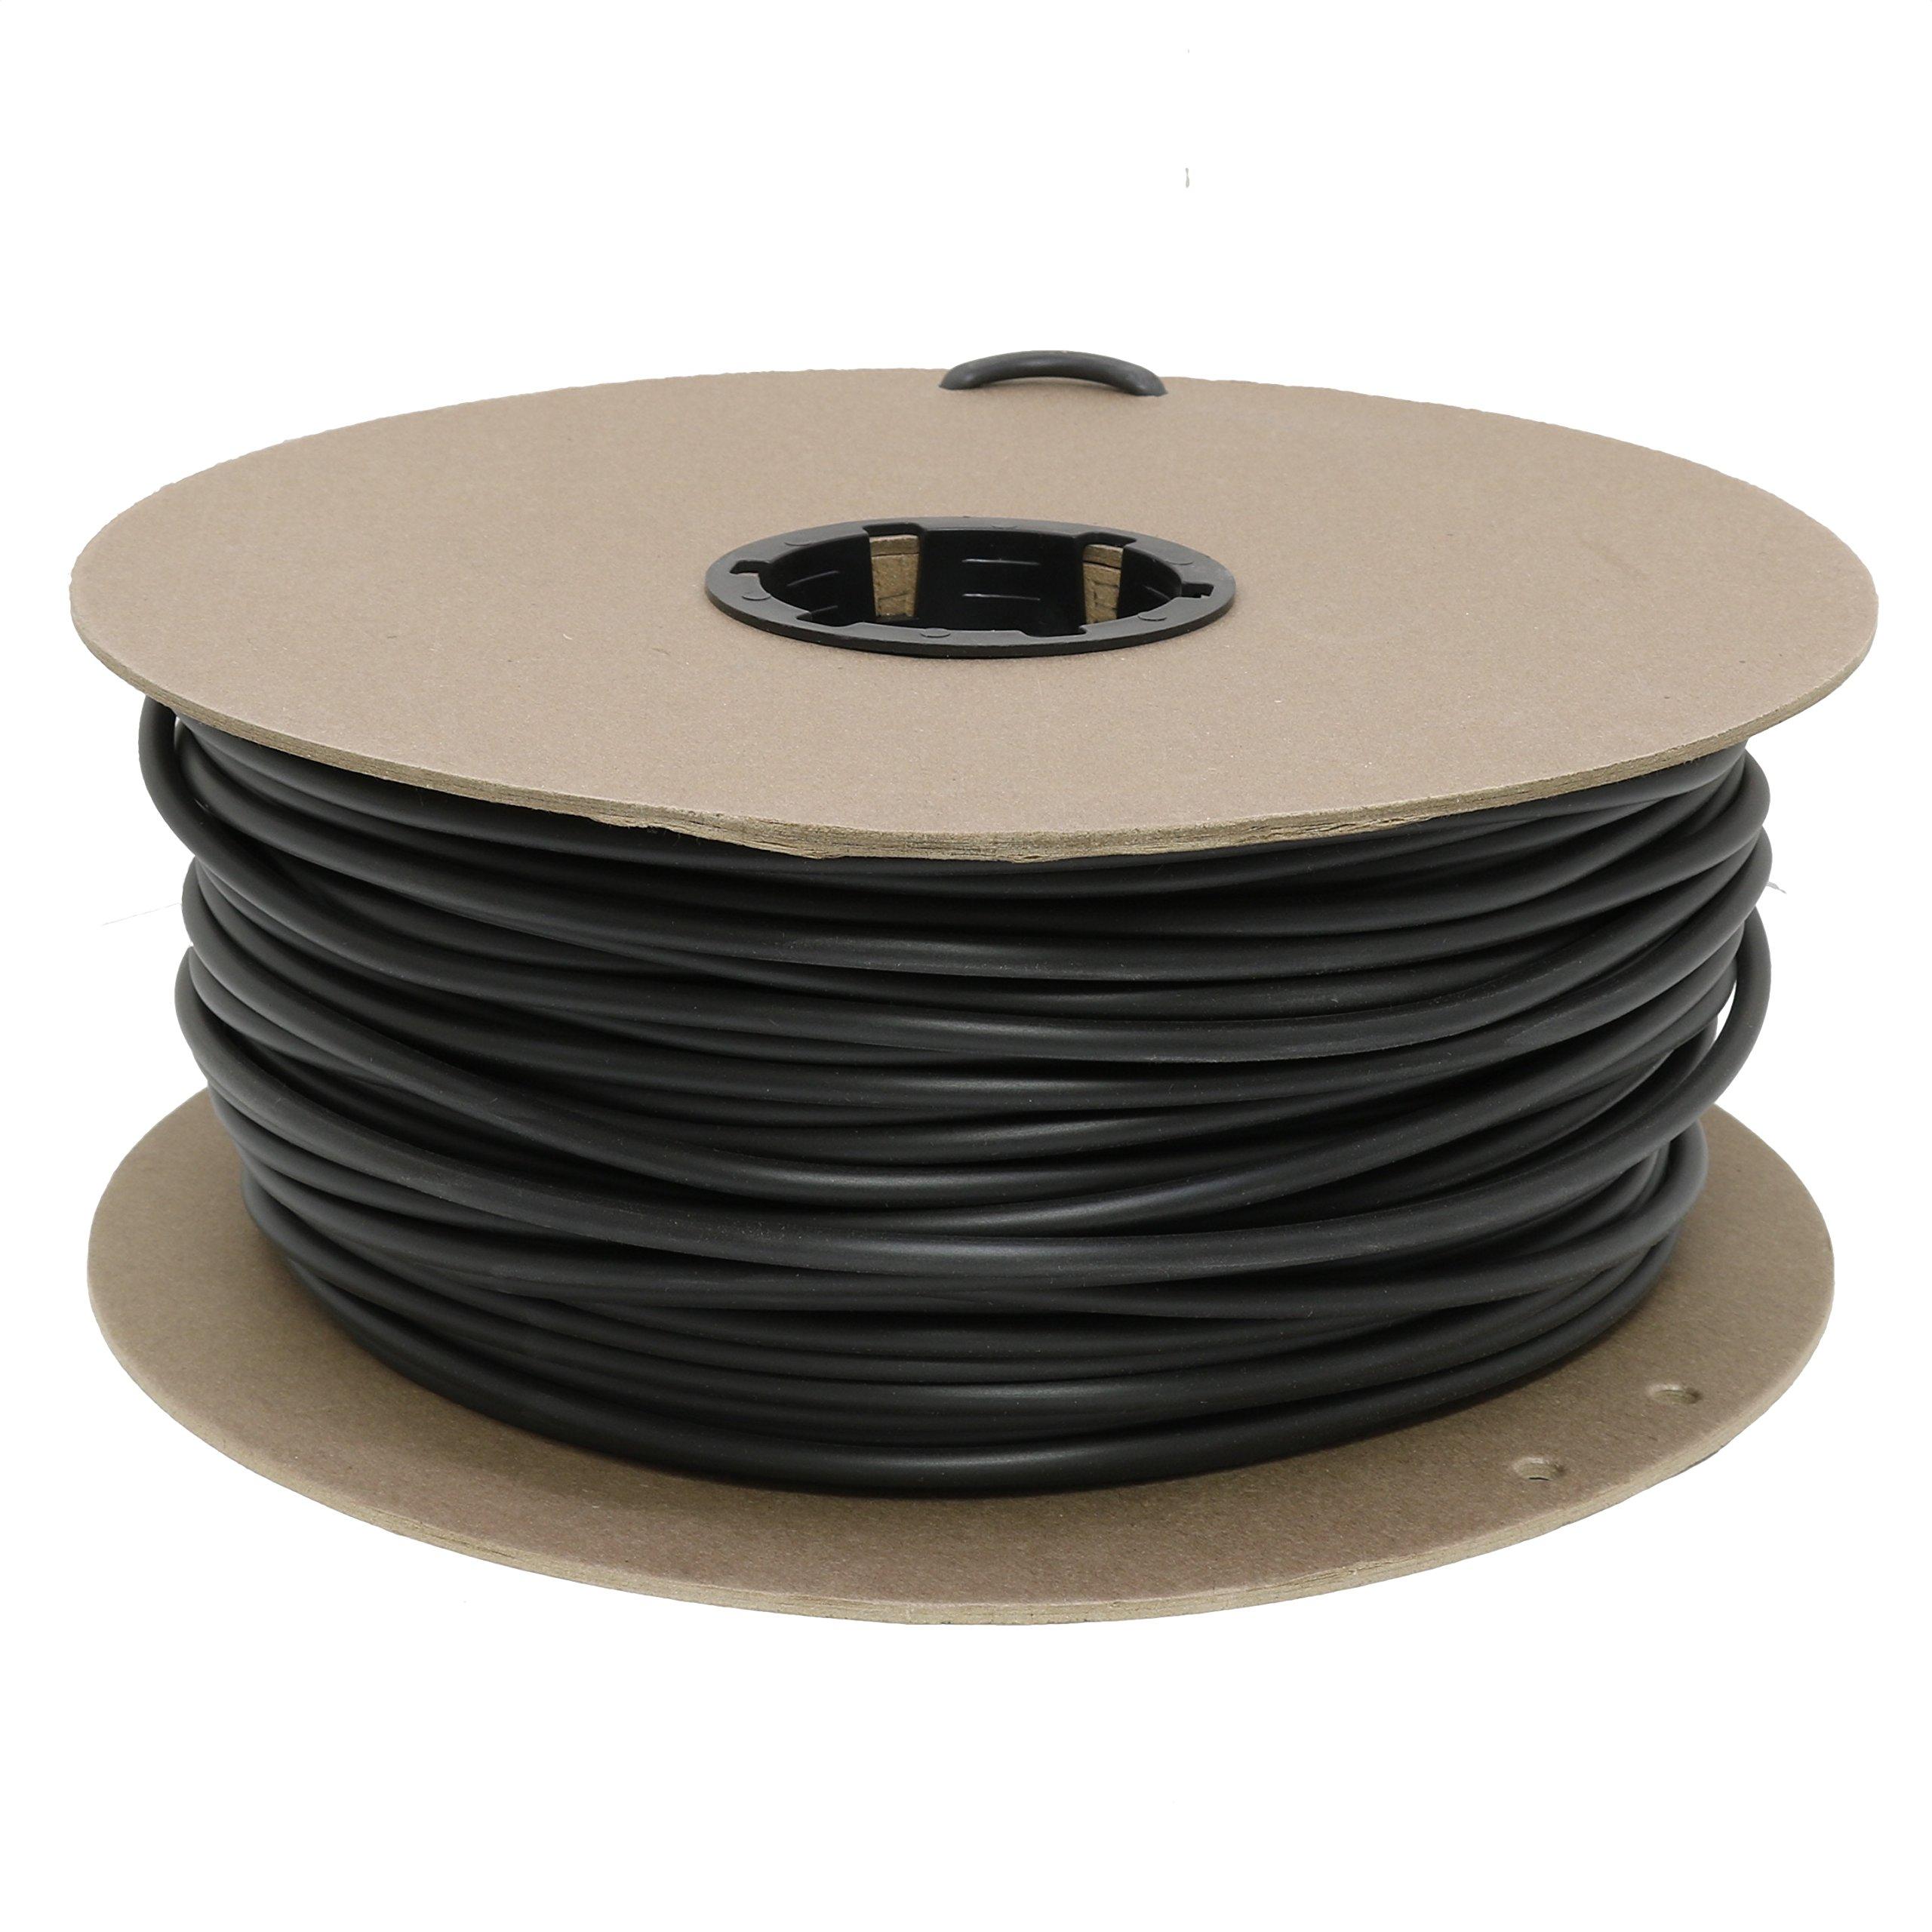 Drip Depot Vinyl Tubing - Size : 1/4 - Length : 500' - Color : Black